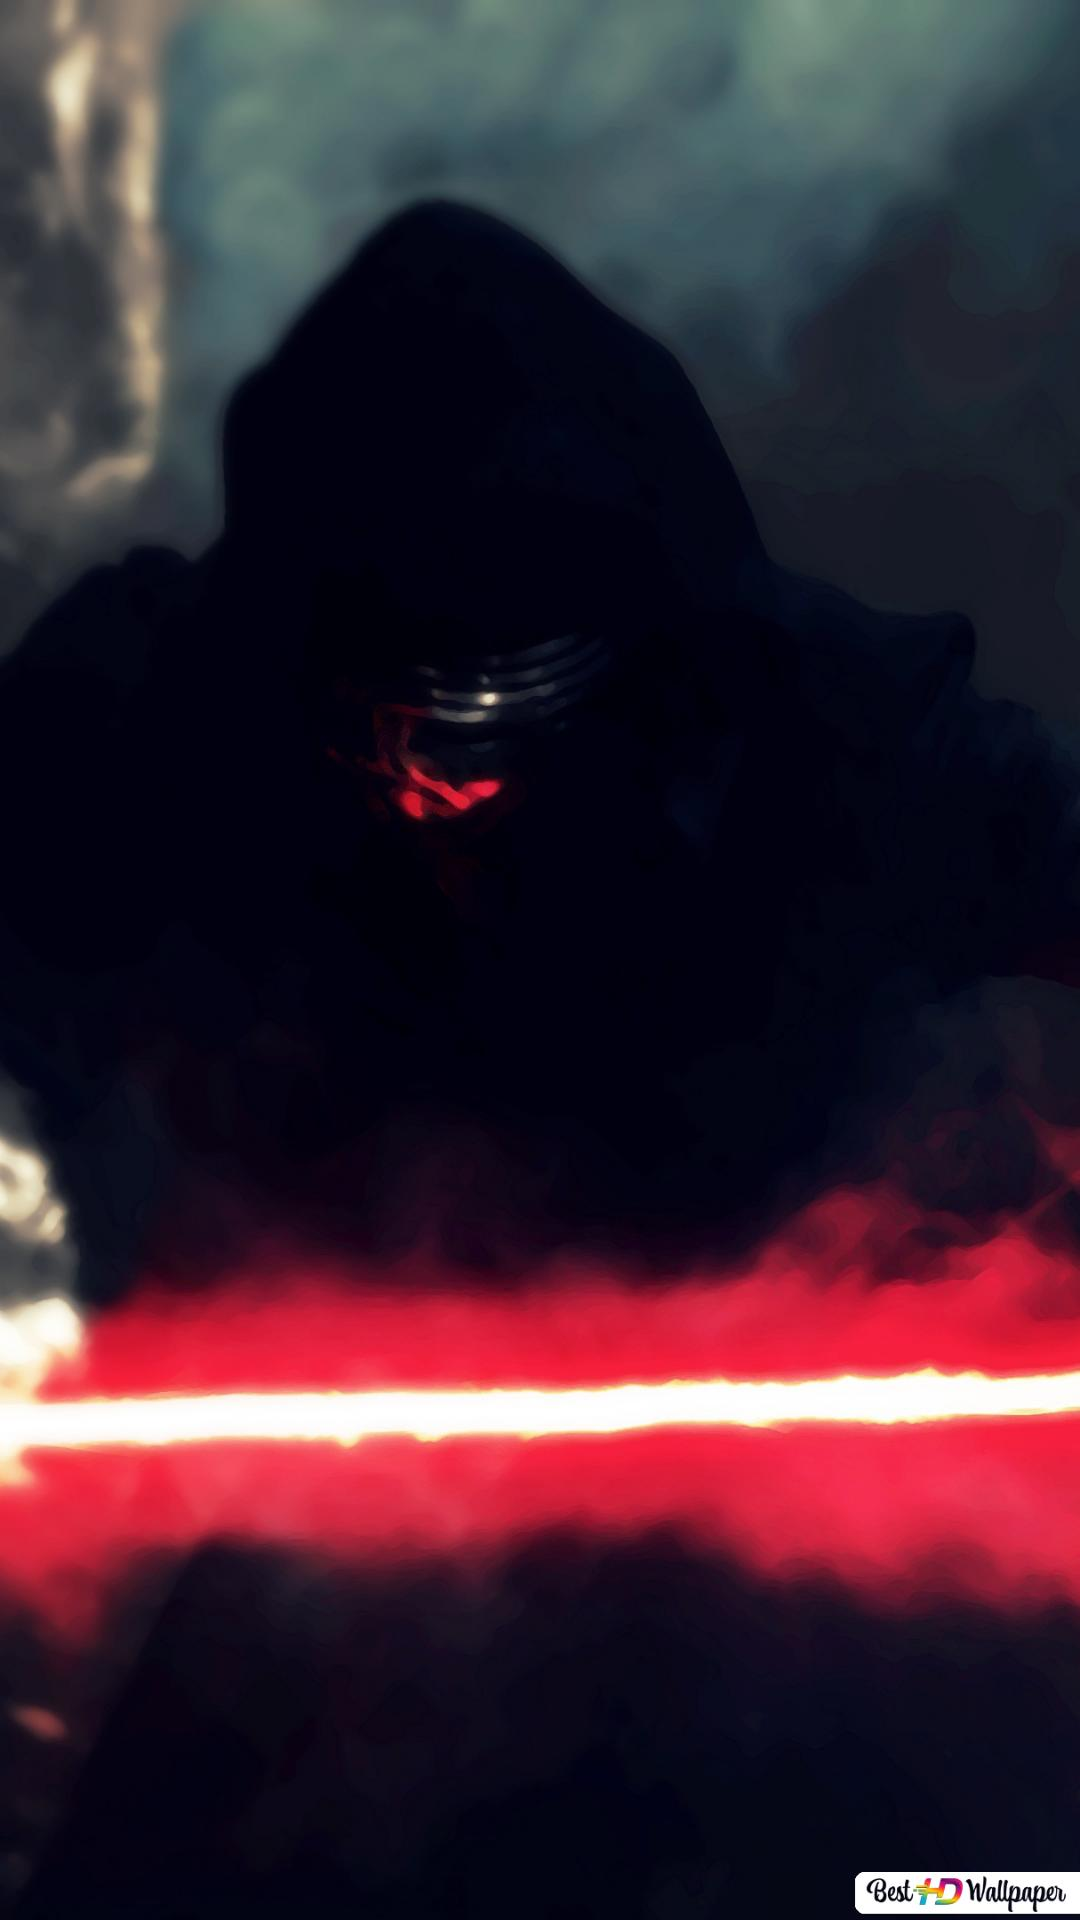 Star Wars 5 Kylo Ren Hd Wallpaper Download